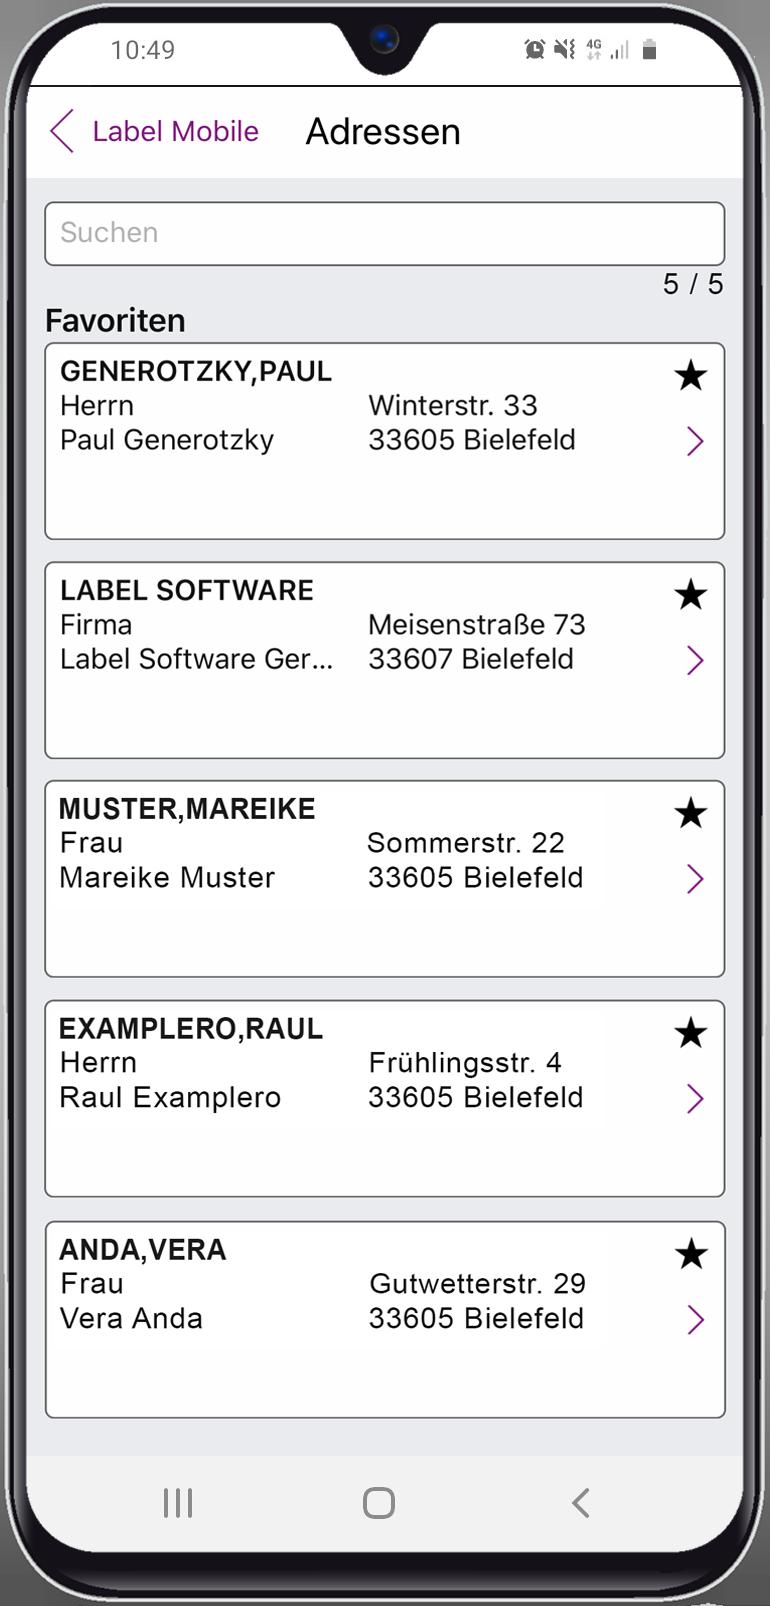 Label Mobile Adressdetails